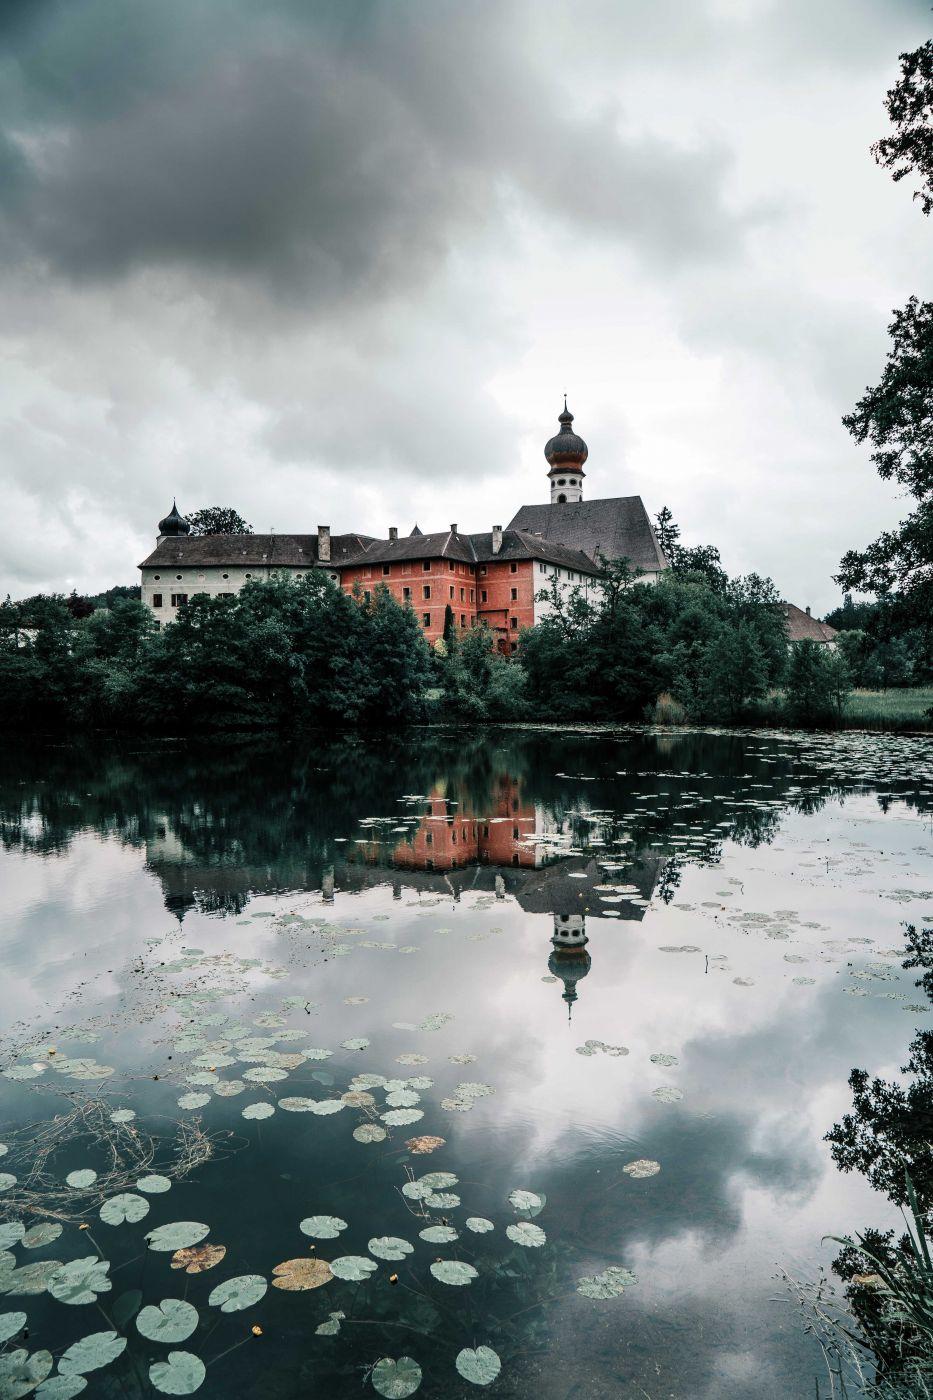 Höglwörther See, Germany